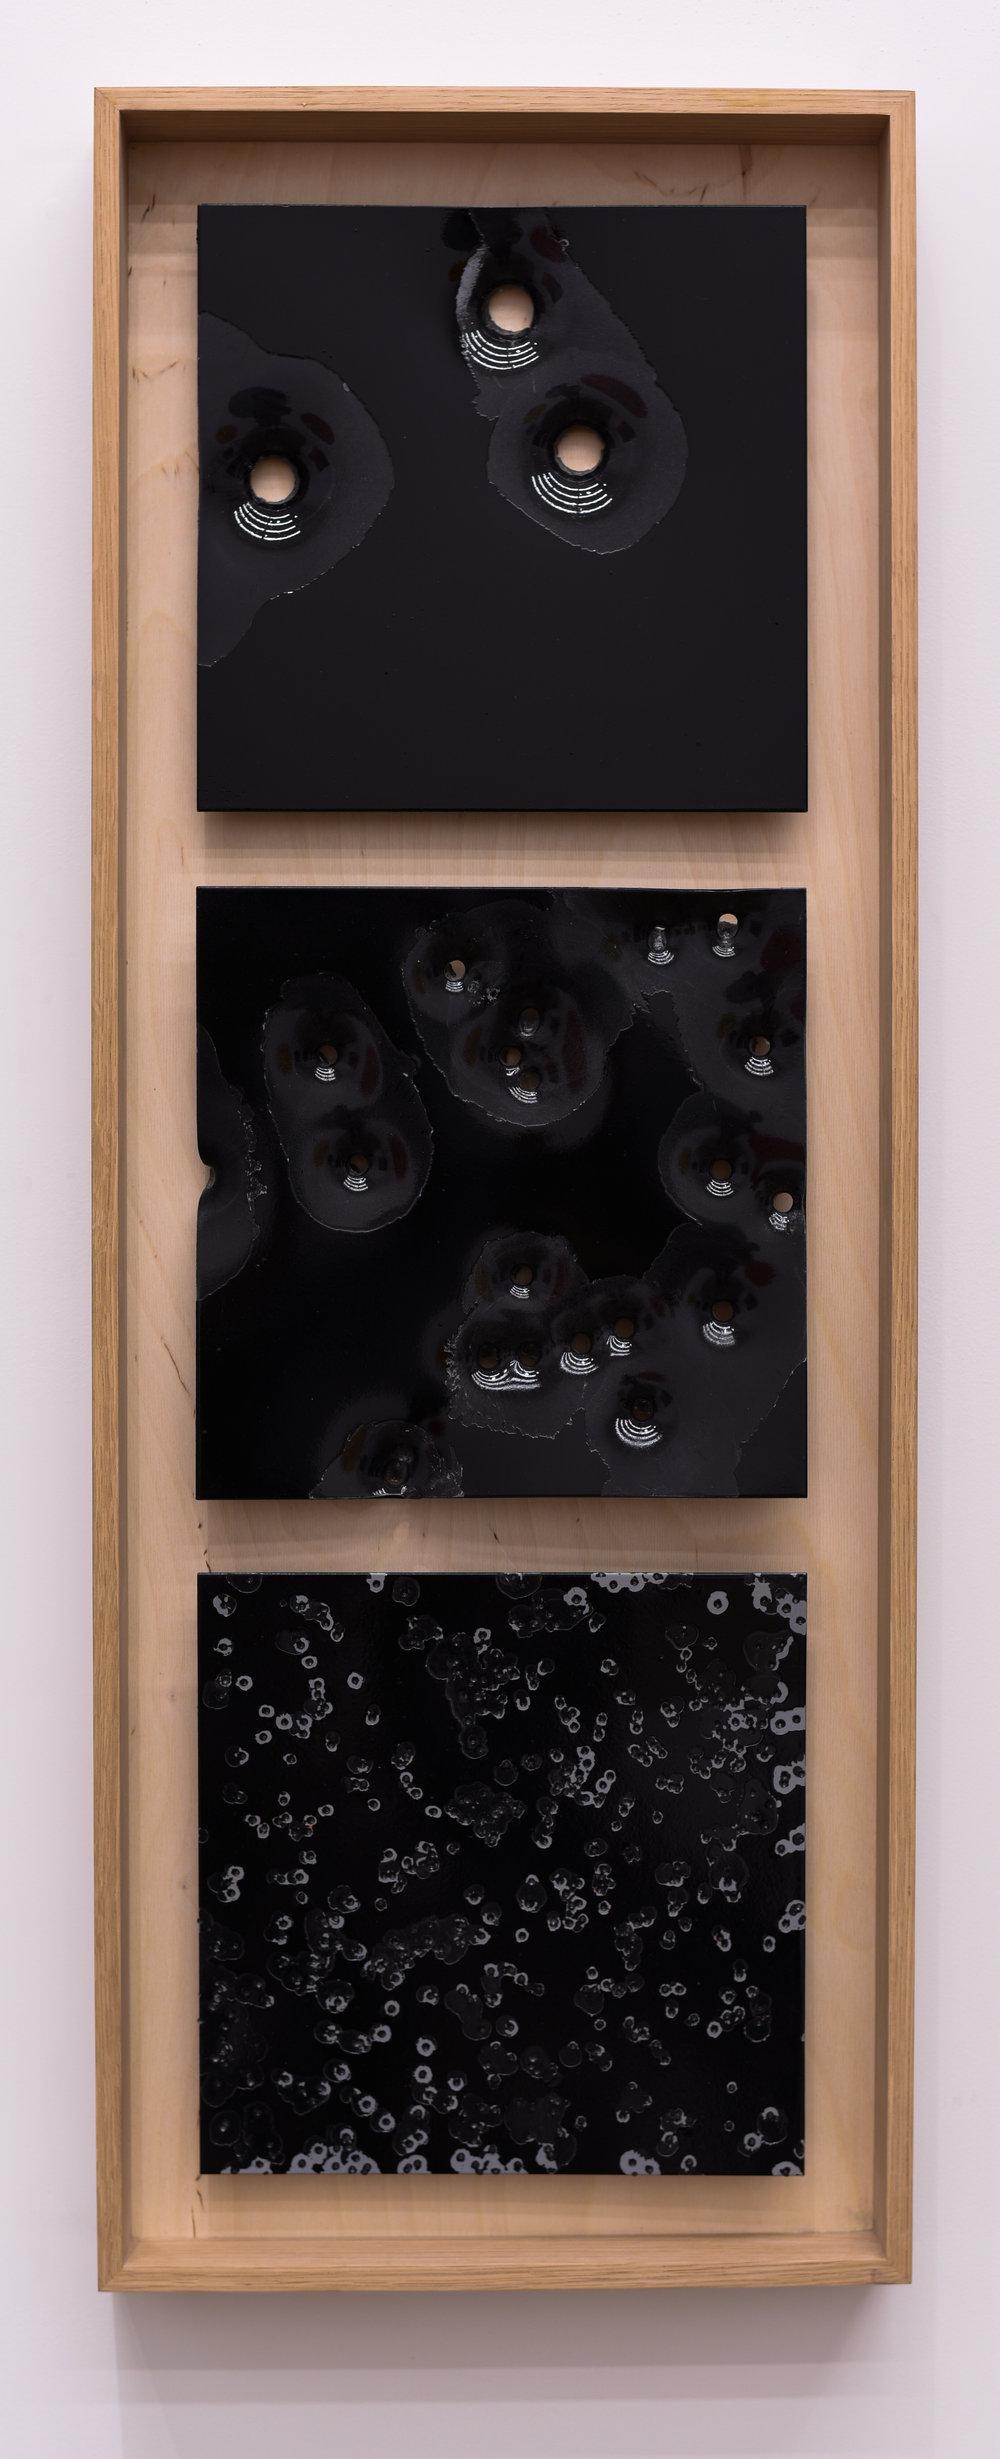 """Bird, Buck, Slug: Black on Black #1 2017""by NIcholas Hunt| 2017 | Oil based enamel on anodized aluminum | 43 × 16 in Inquire Price"